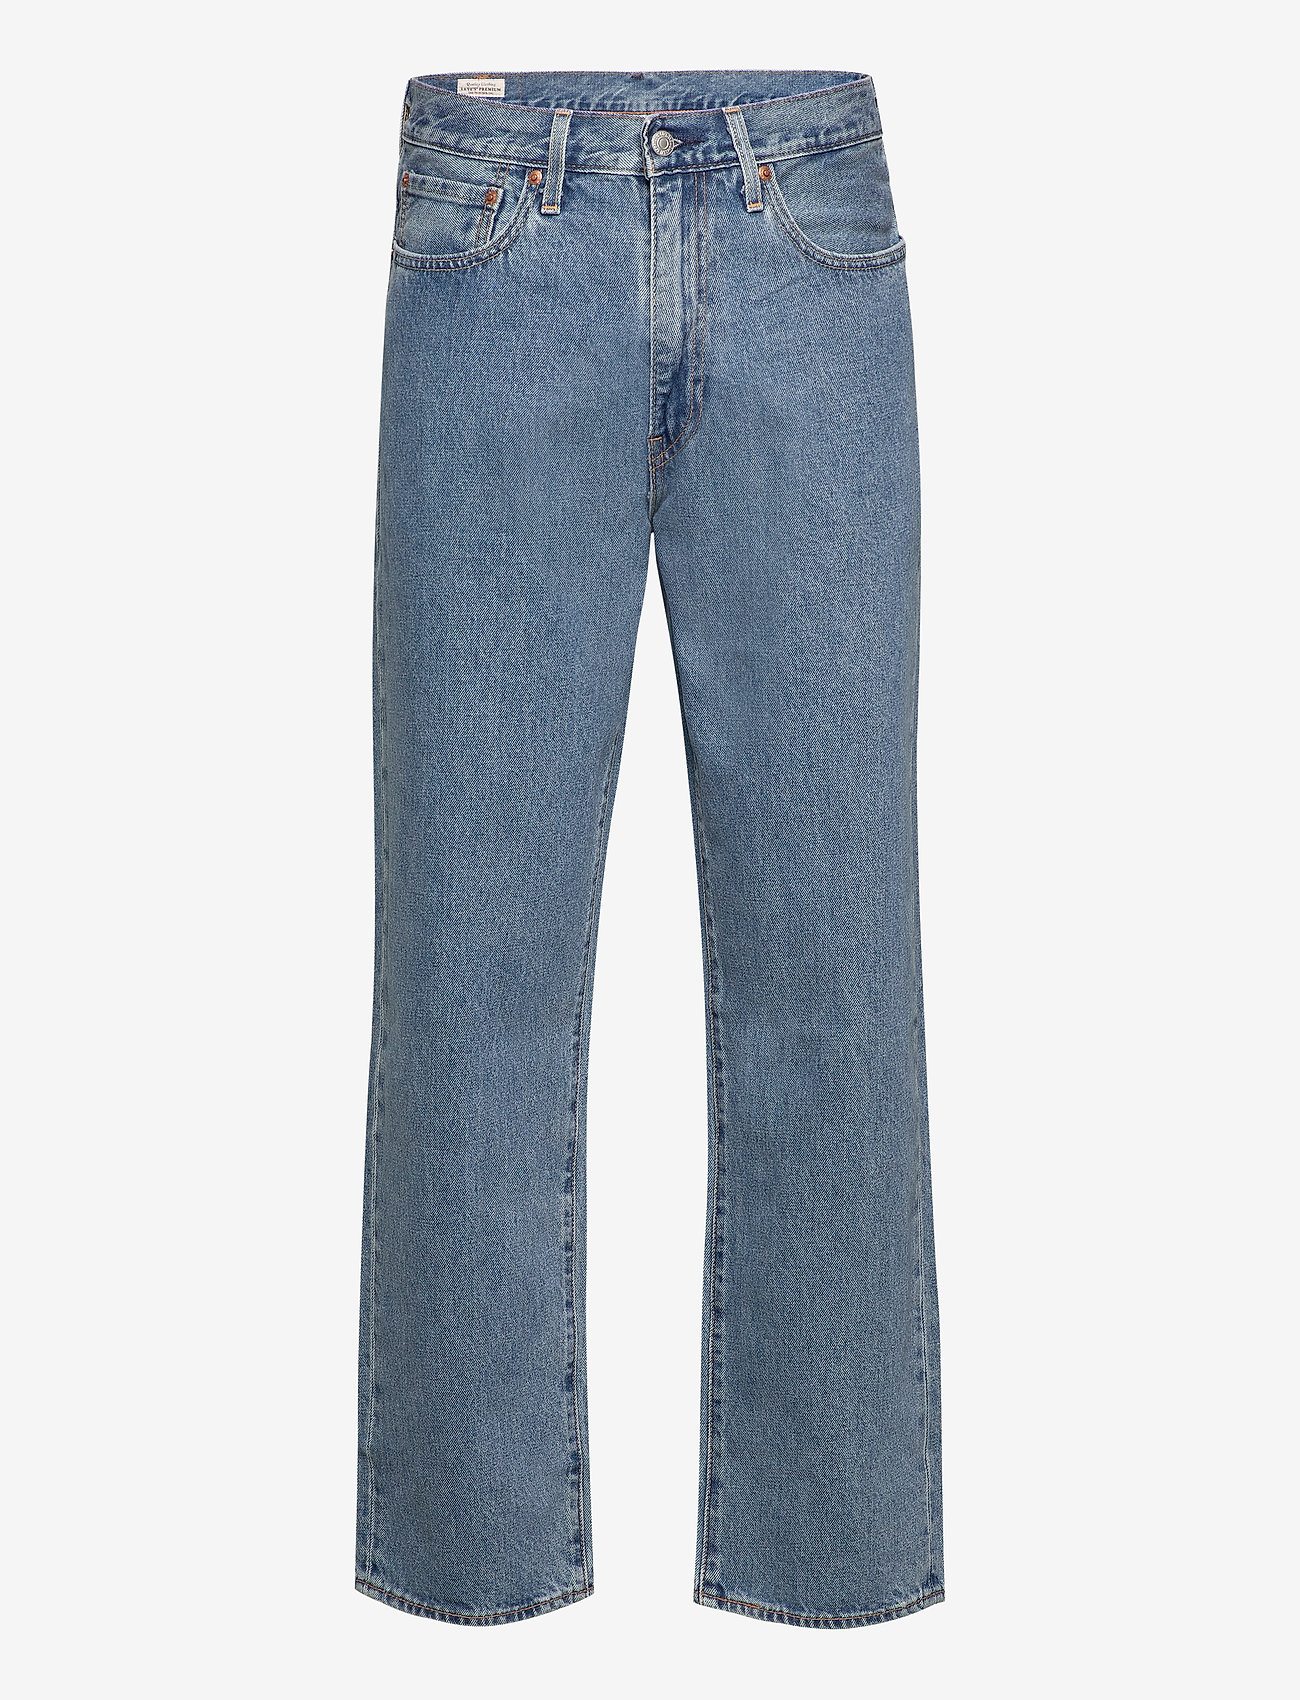 LEVI´S Men - STAY LOOSE DENIM HANG LOOSEN U - relaxed jeans - light indigo - worn in - 1